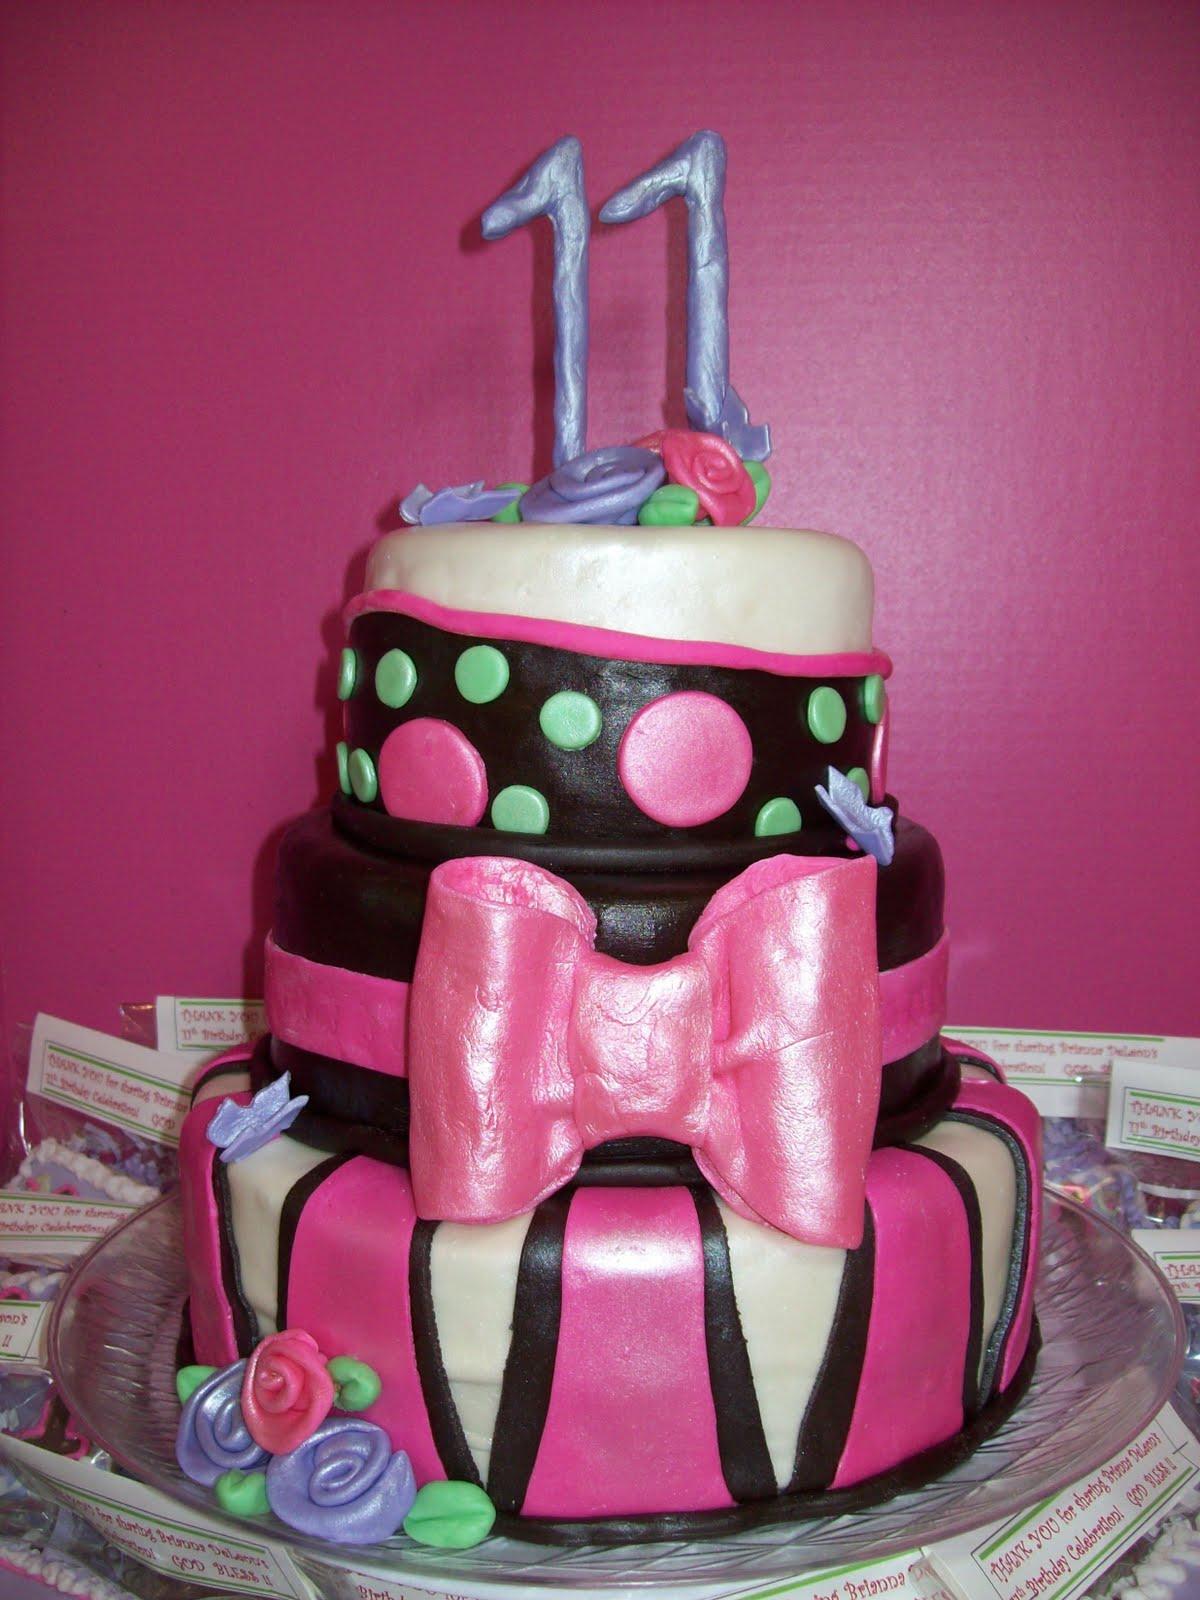 11th Birthday Cake 11th Birthday Cake Goodies 11th Birthday Cake